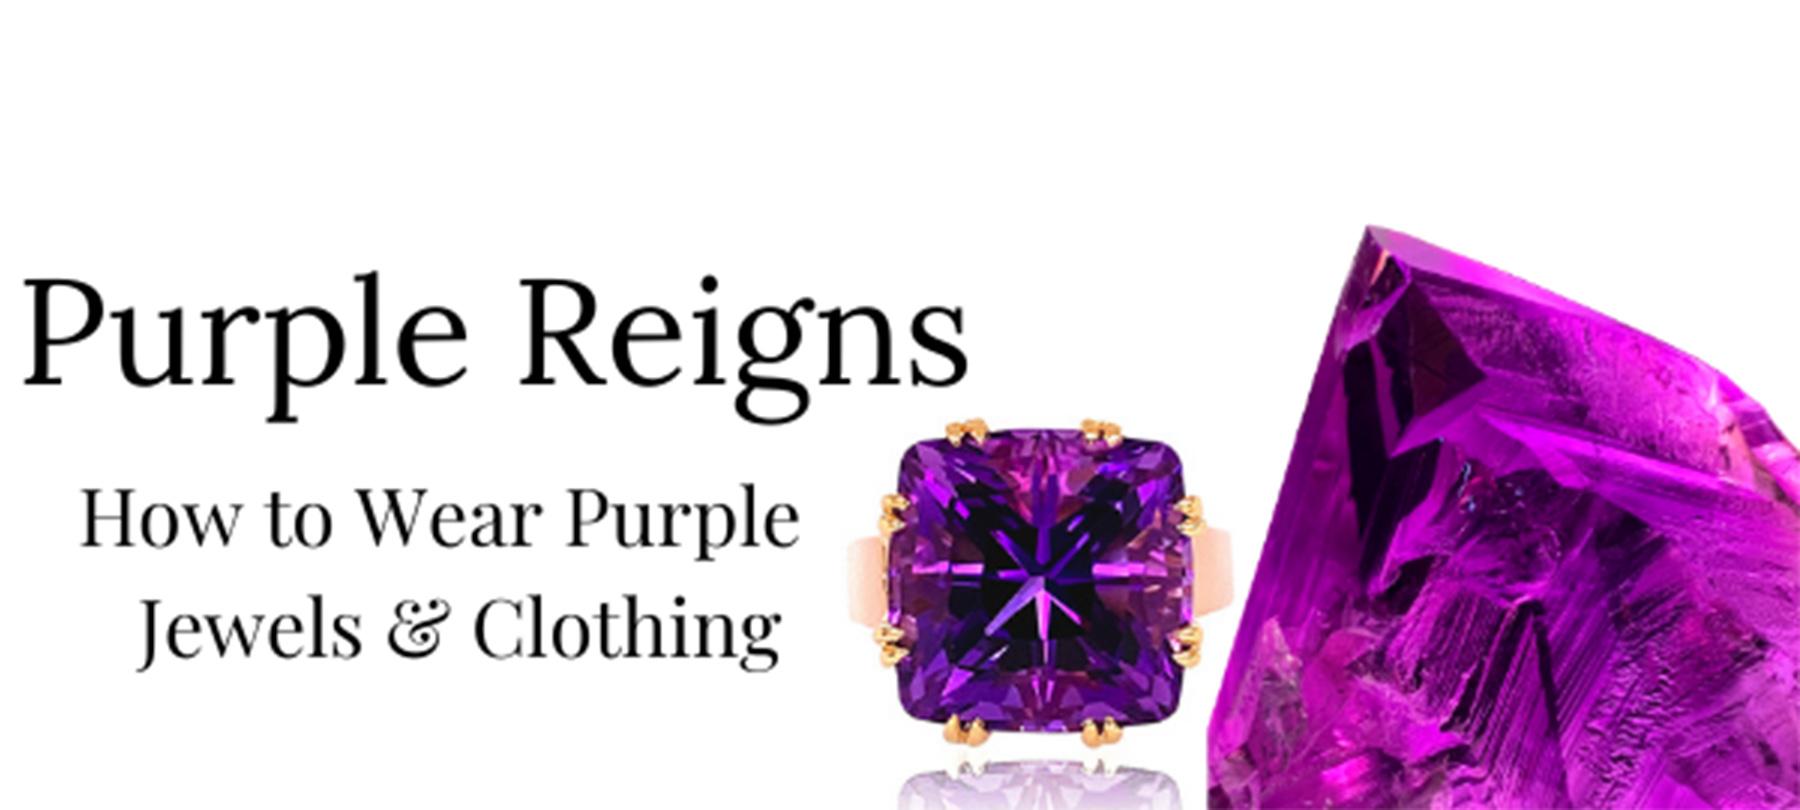 Purple Reigns blog post: Amethyst